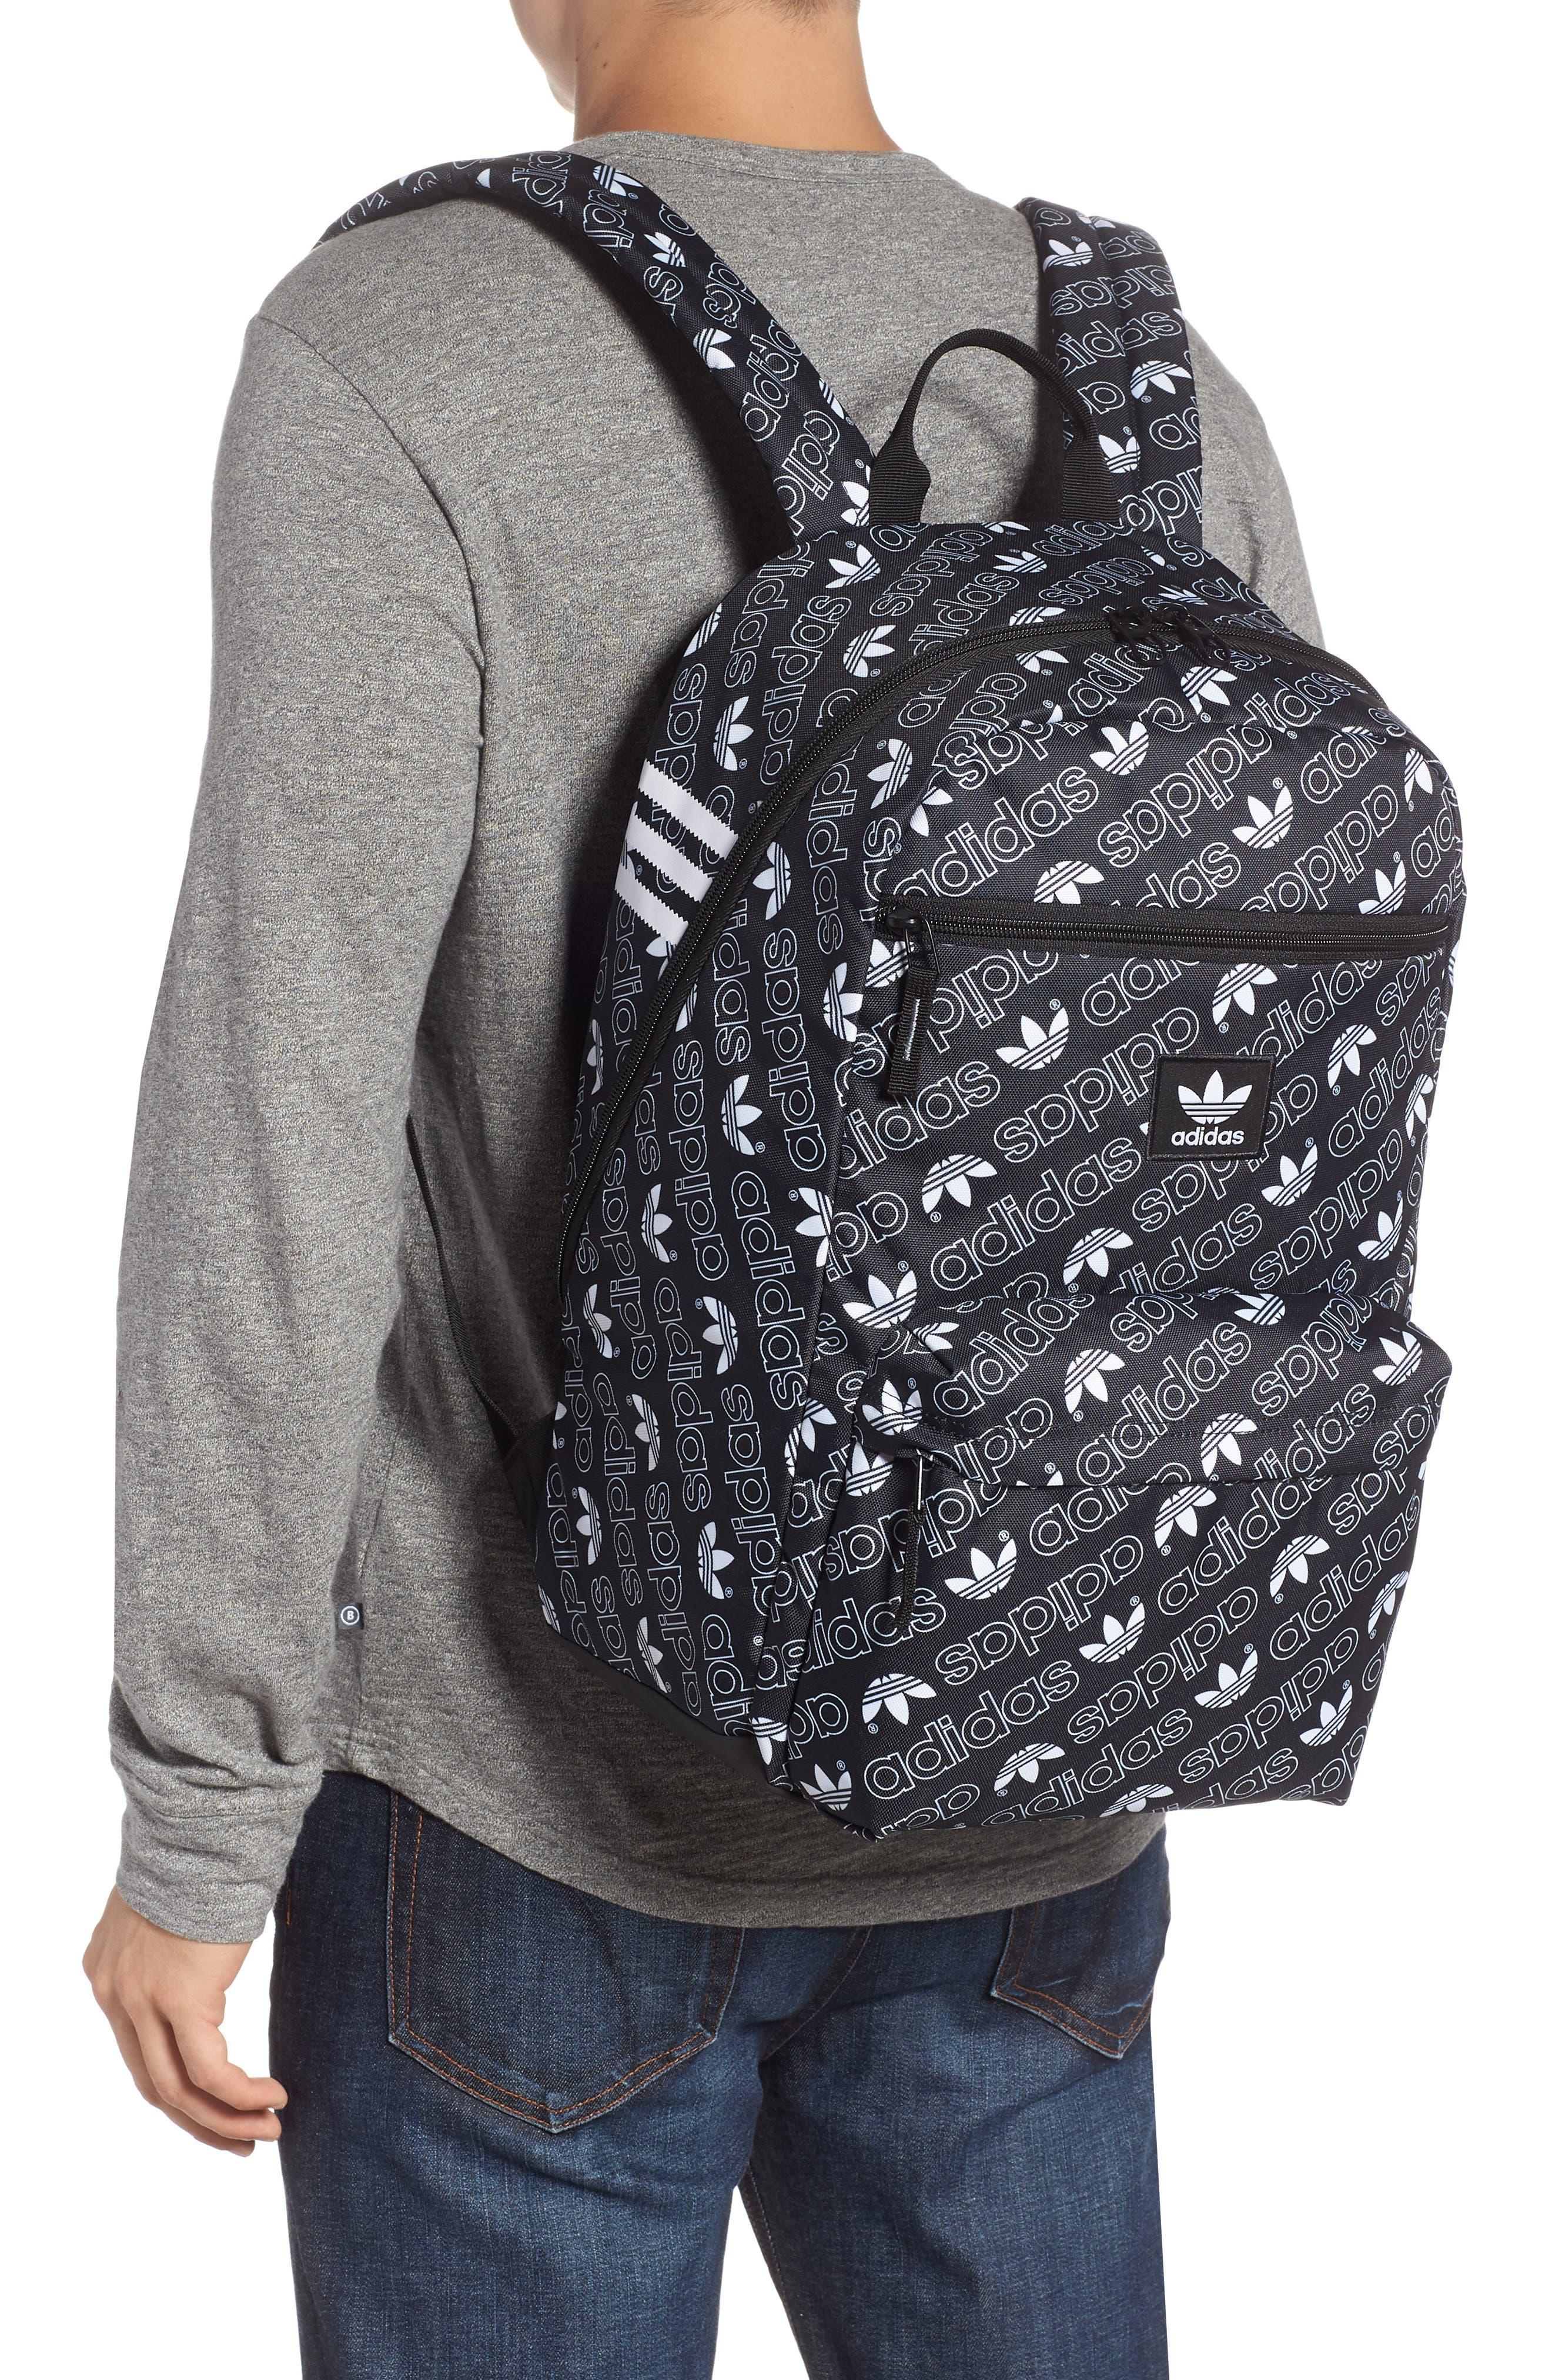 Monogram National Backpack,                             Alternate thumbnail 2, color,                             BLACK MONOGRAM